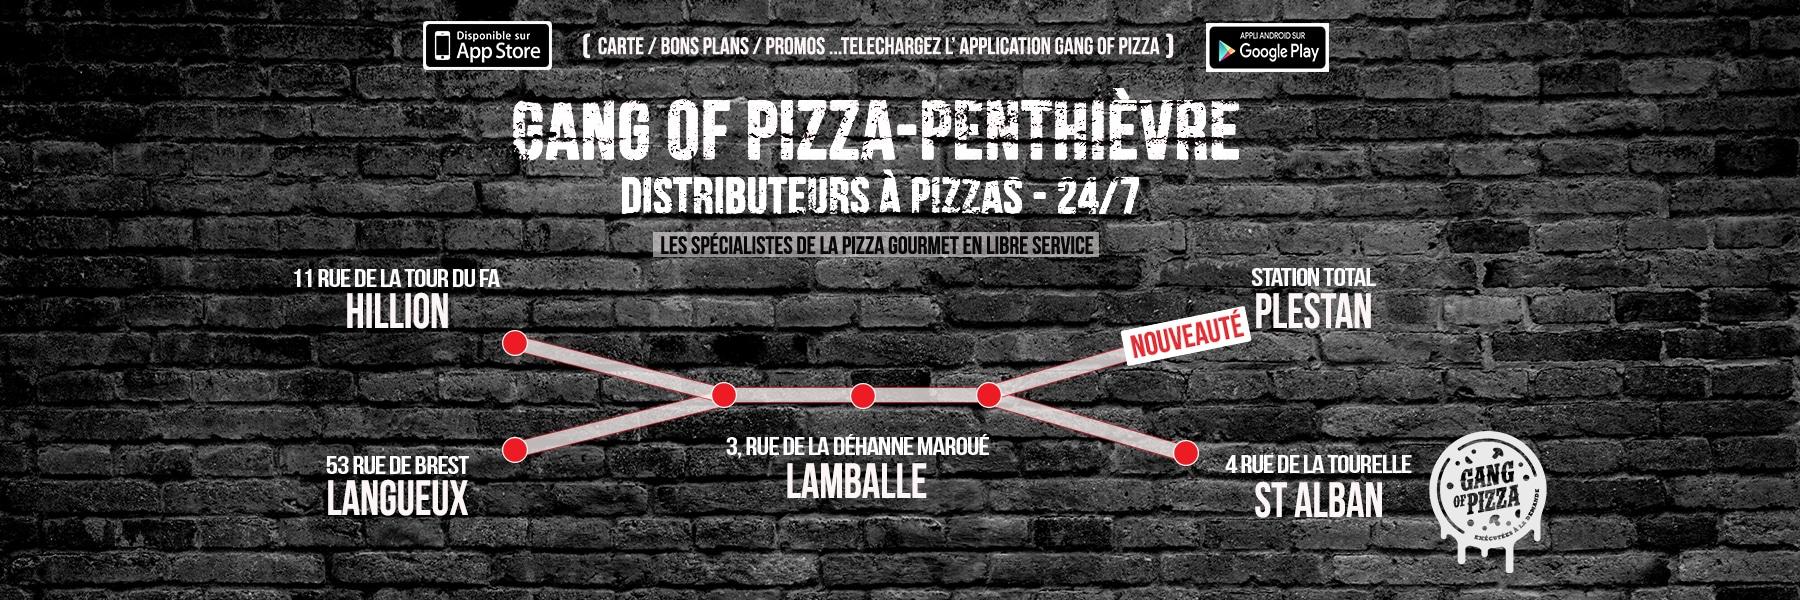 gang-of-pizza-debarque-a-plestan-distributeurs-pizzas-24-7-penthievre-11ruedes31martys-station-total